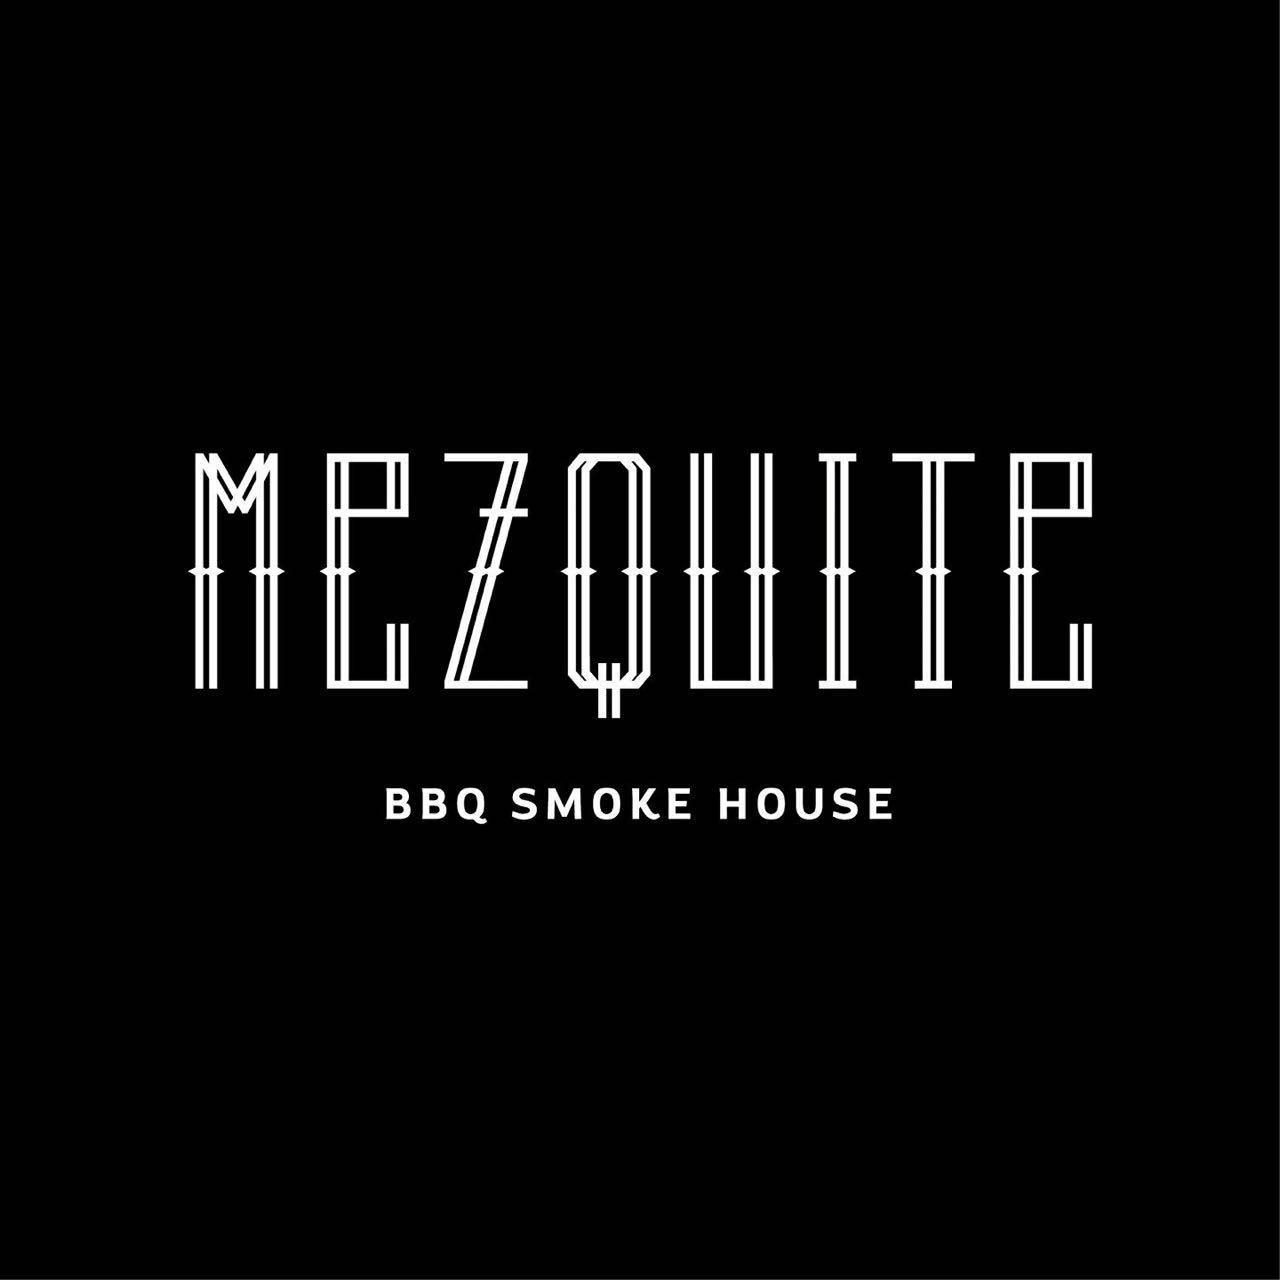 Mezquite BBQ